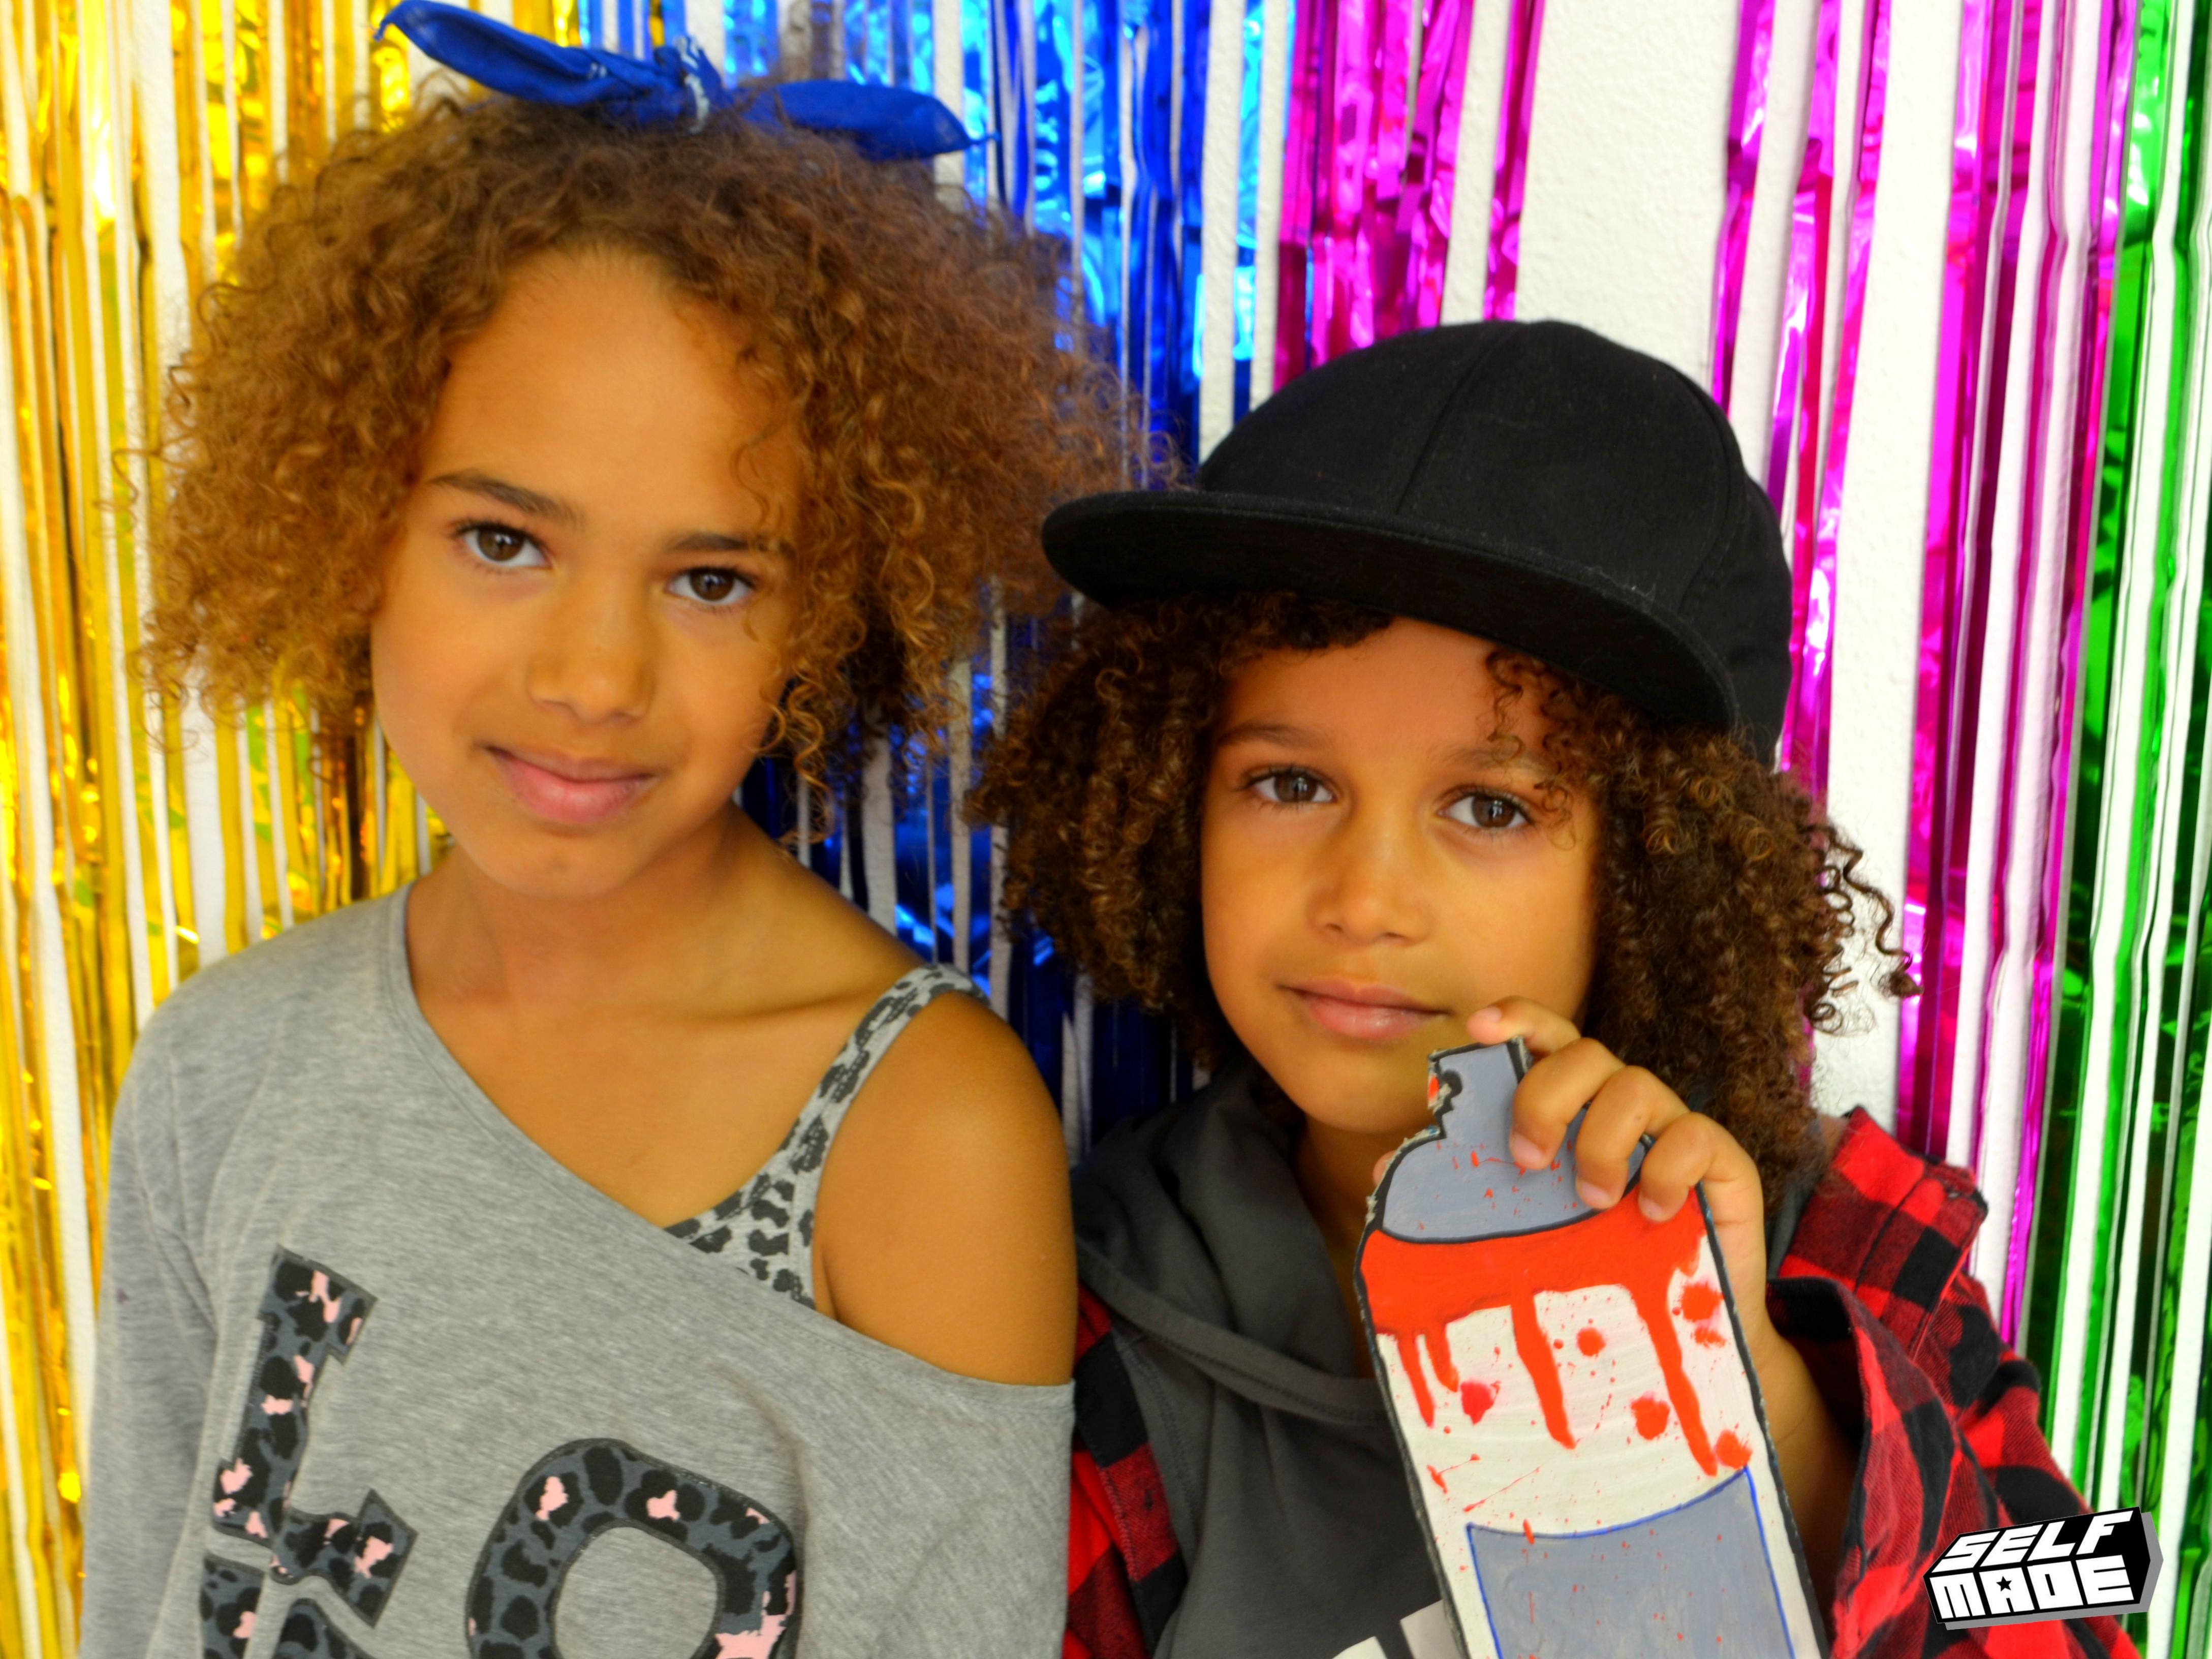 Hiphop kinderen spuitbus